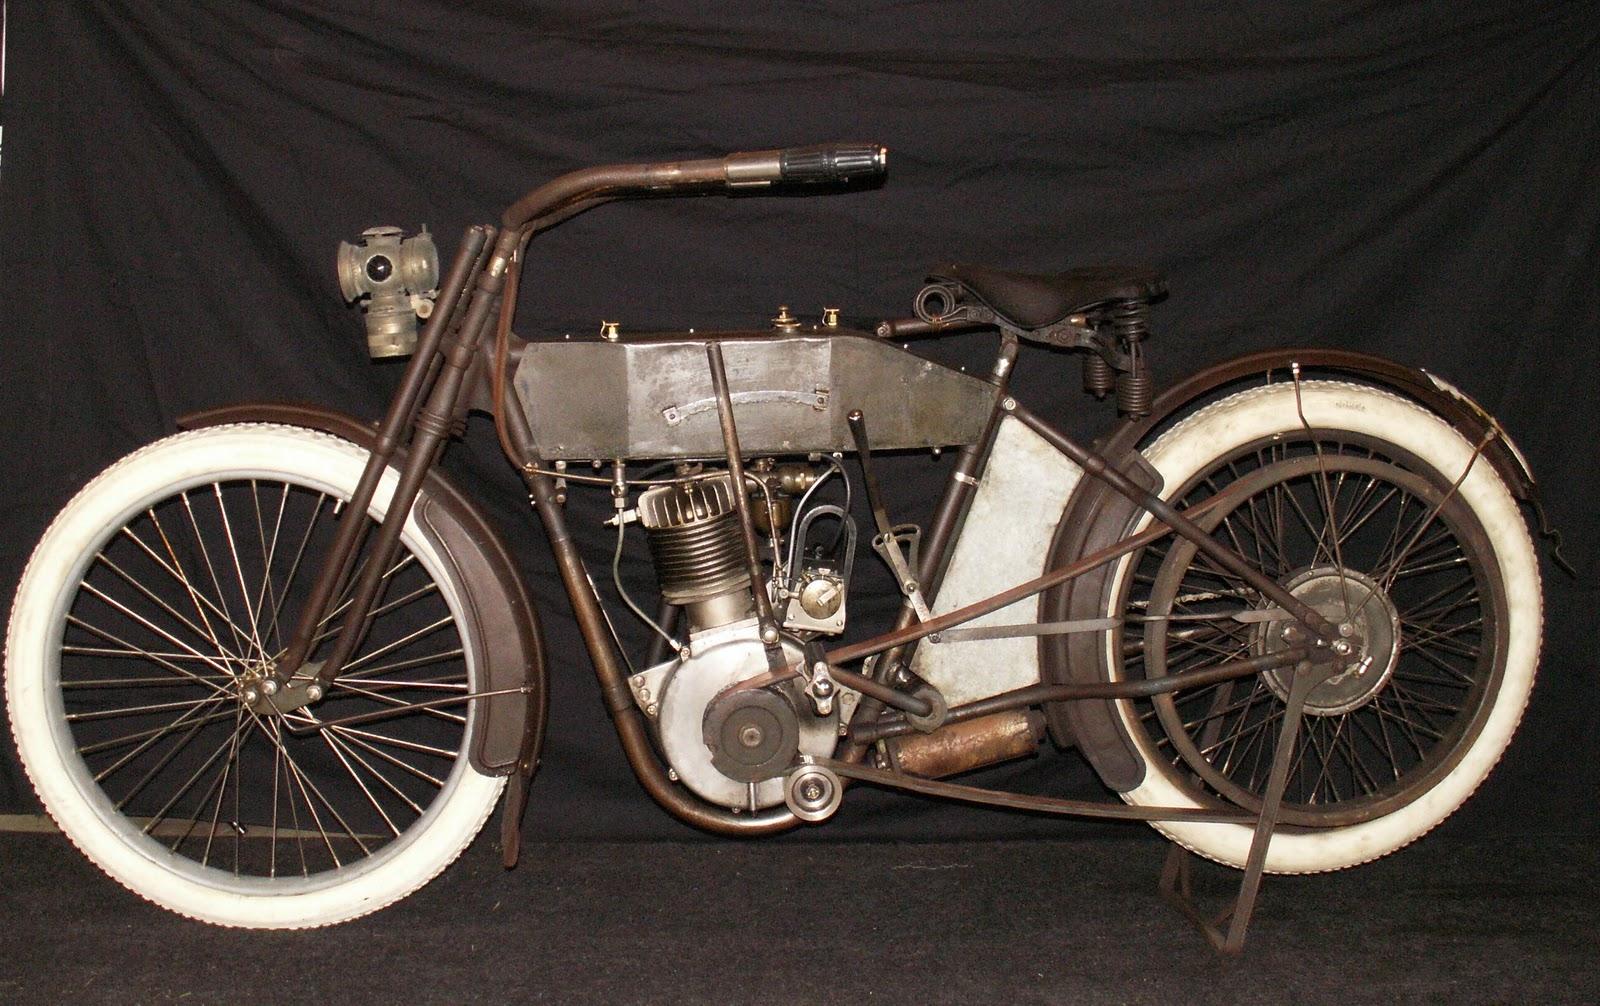 Harley-Davidson 1912 Silent Gray Fellow